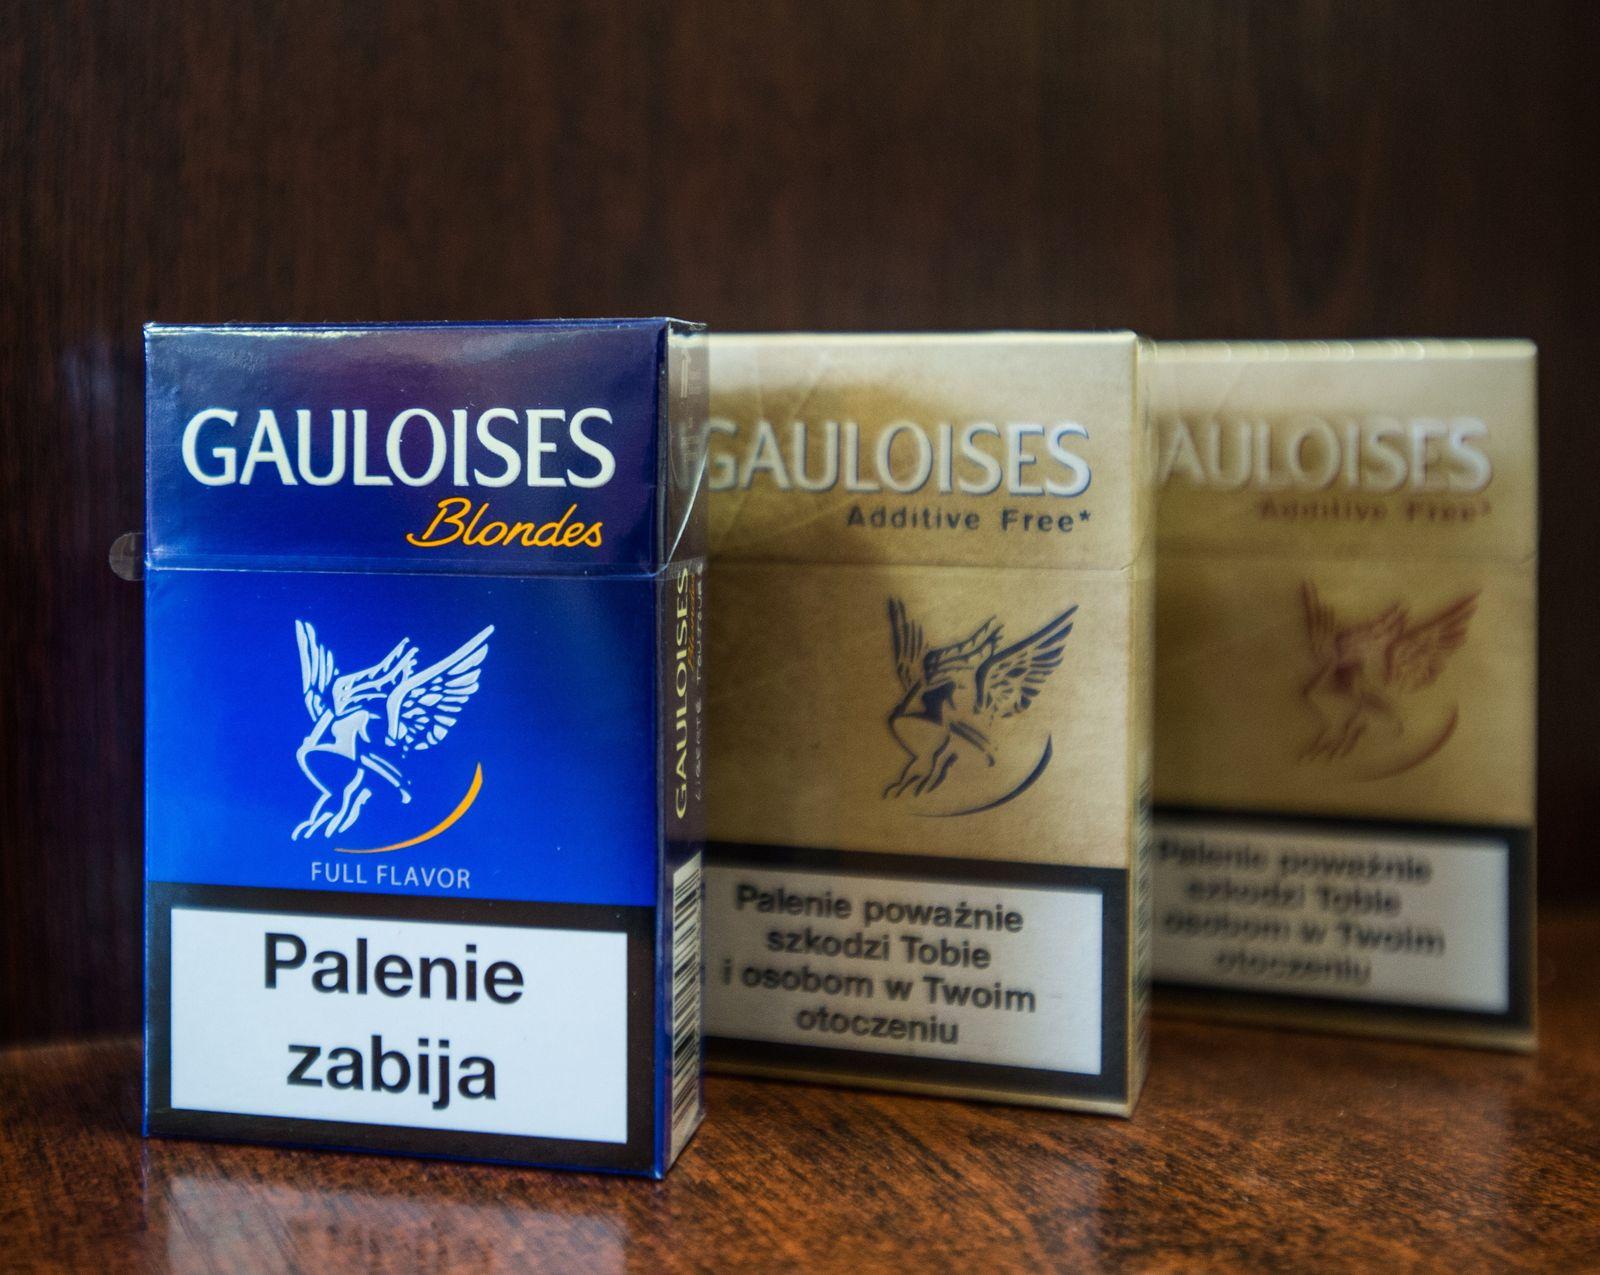 Zigaretten/Gauloises/Imperial